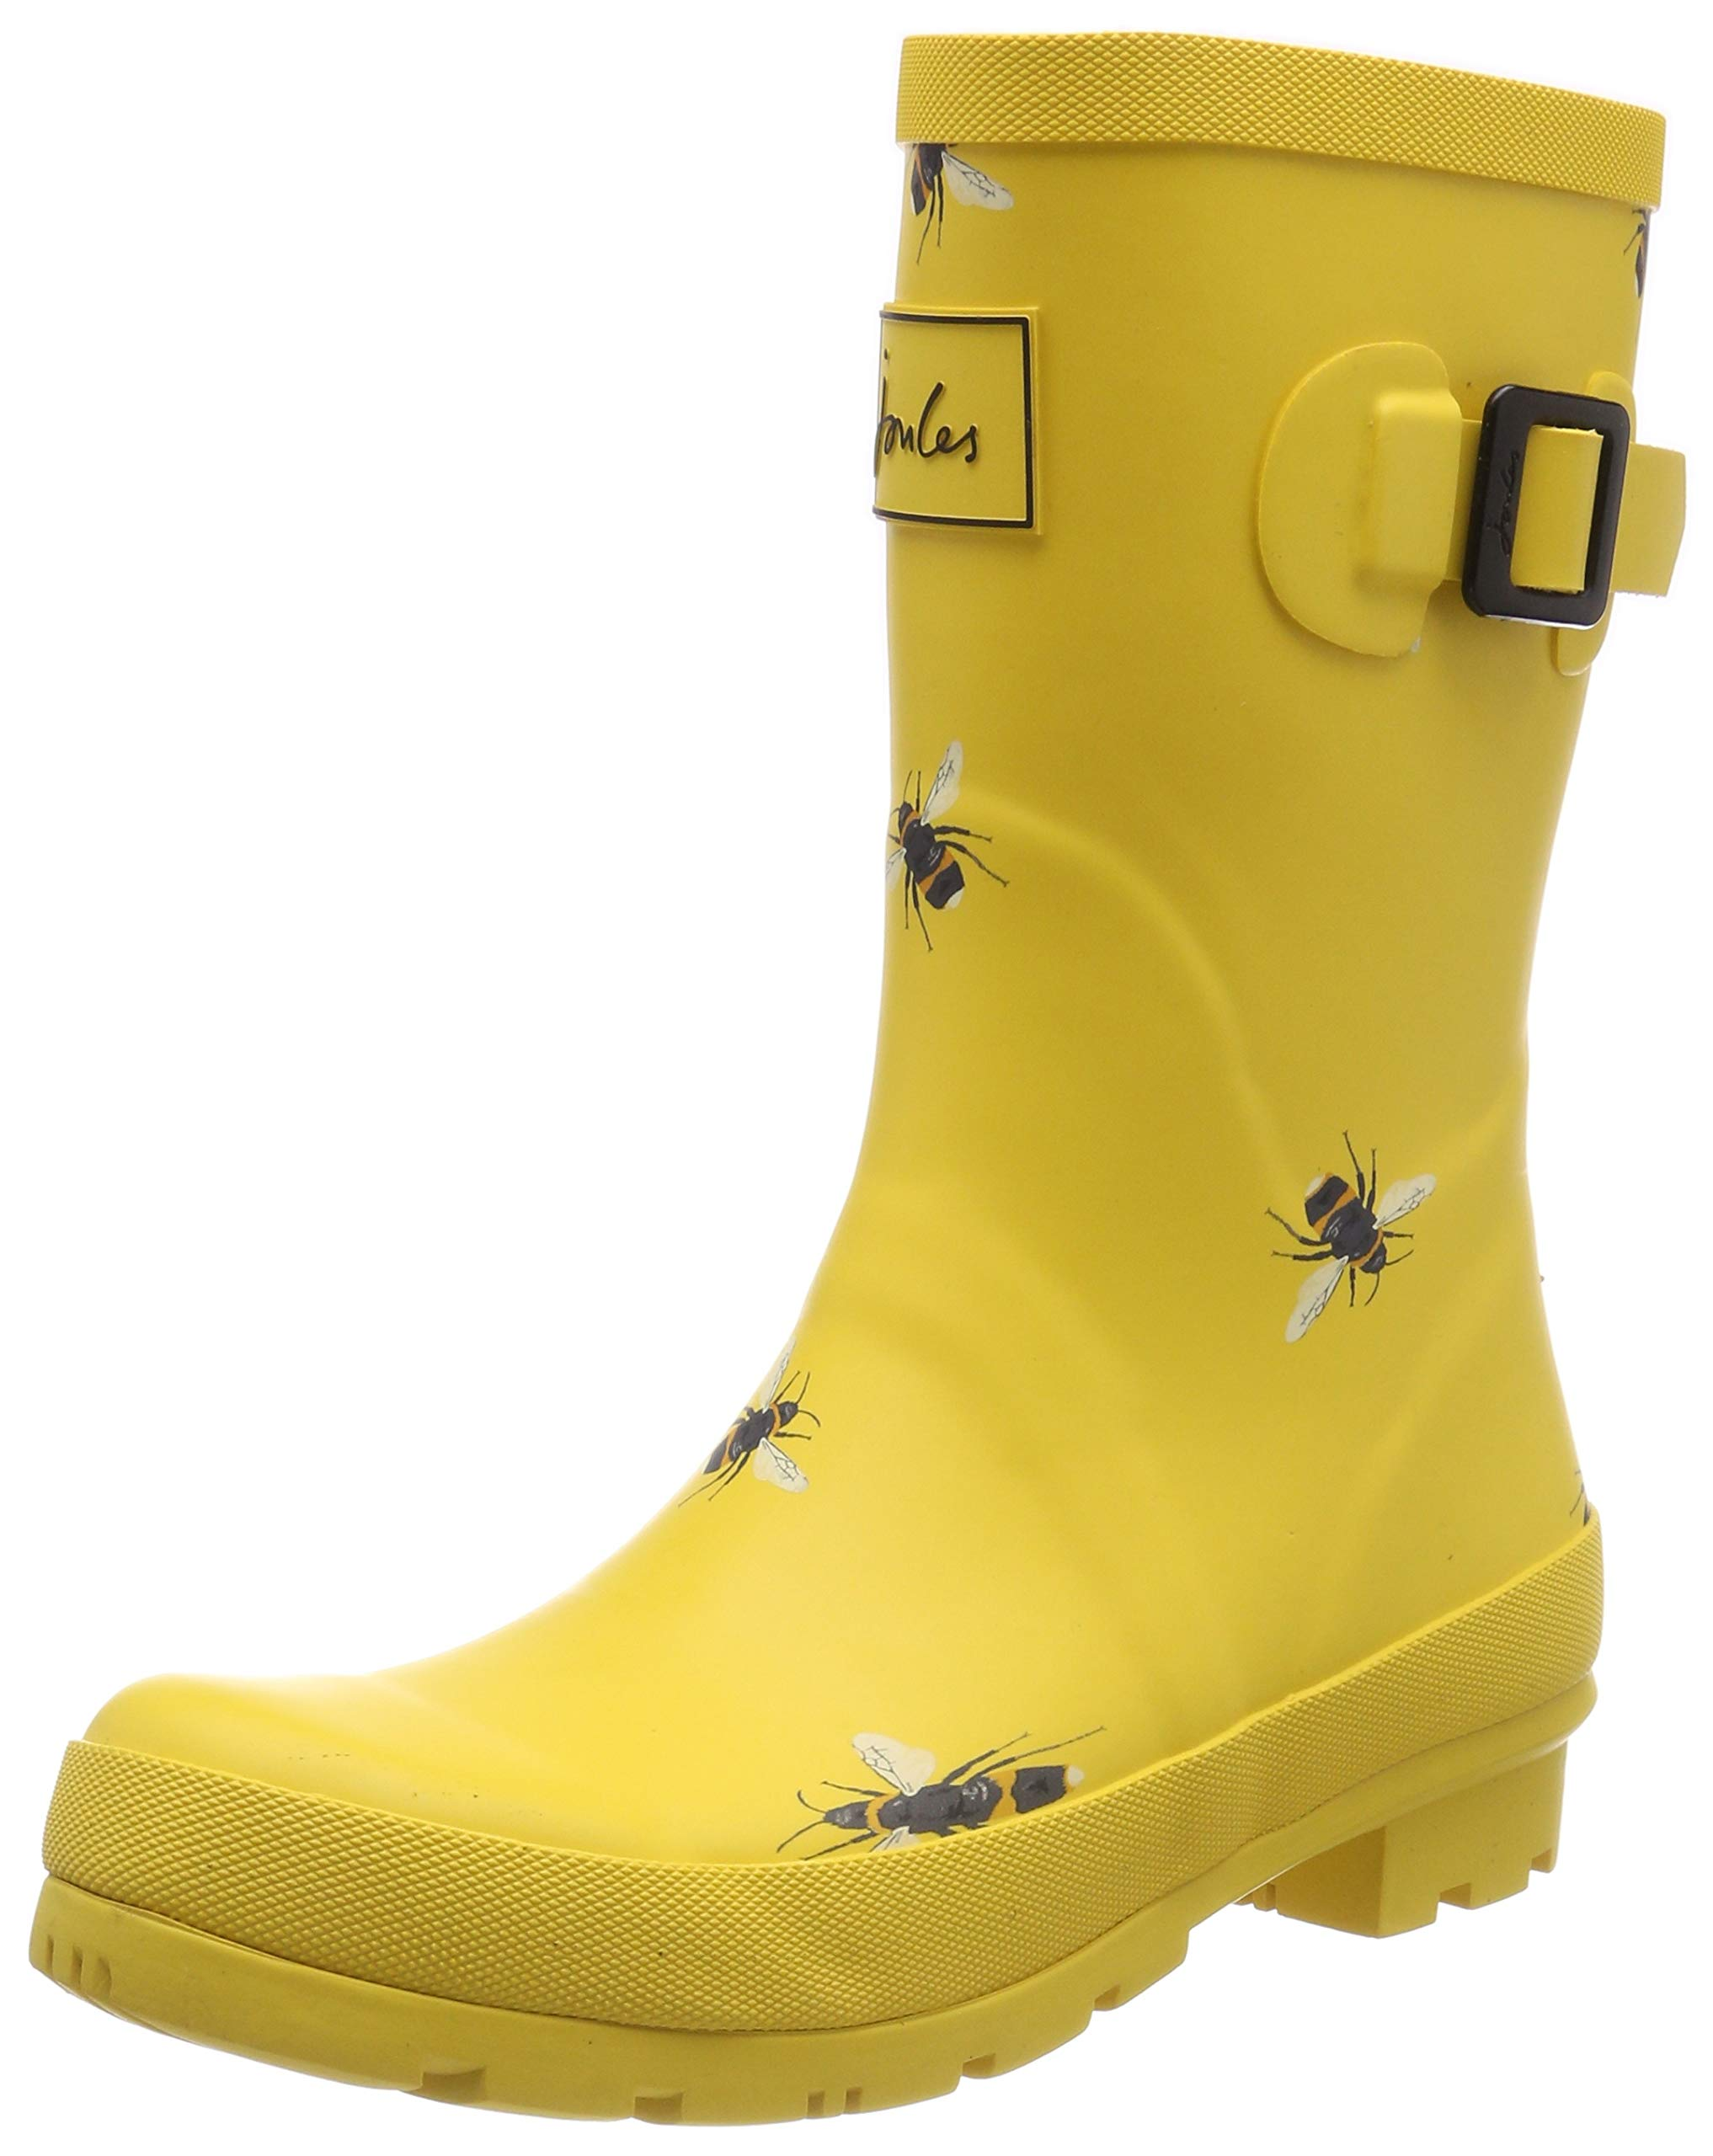 1d3c7d95cad7b Best Rated in Men's Rain Boots & Helpful Customer Reviews - Amazon.com